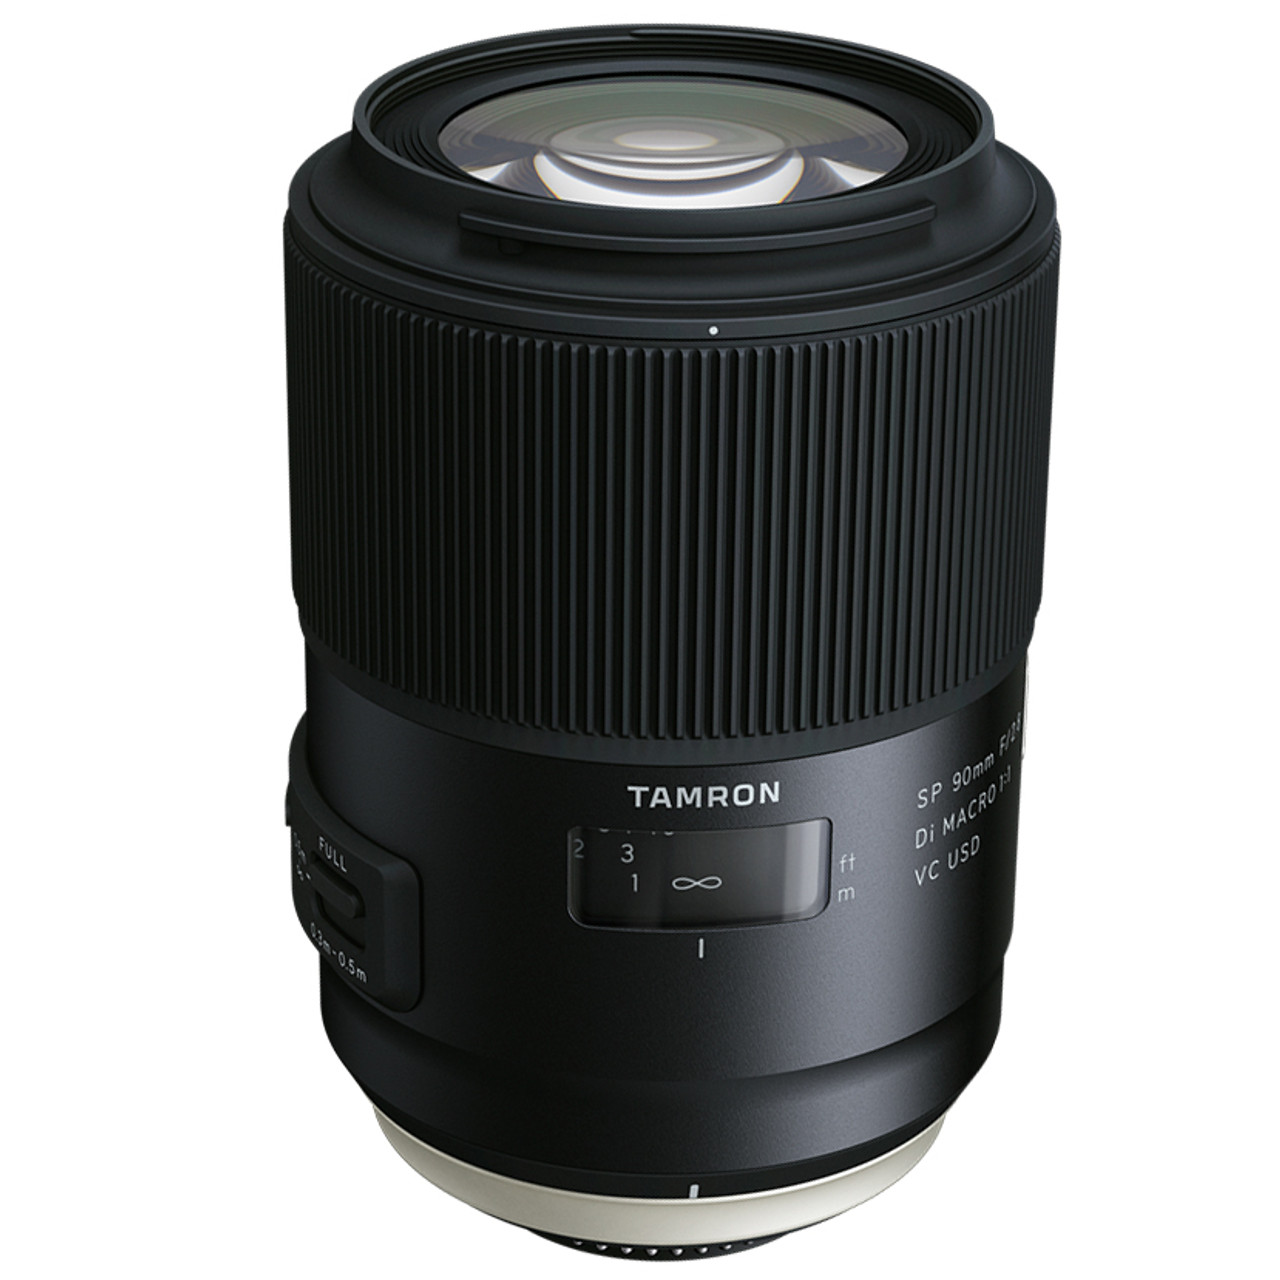 TAMRON SP  90MM F2.8 DI VC USD (NIKON)